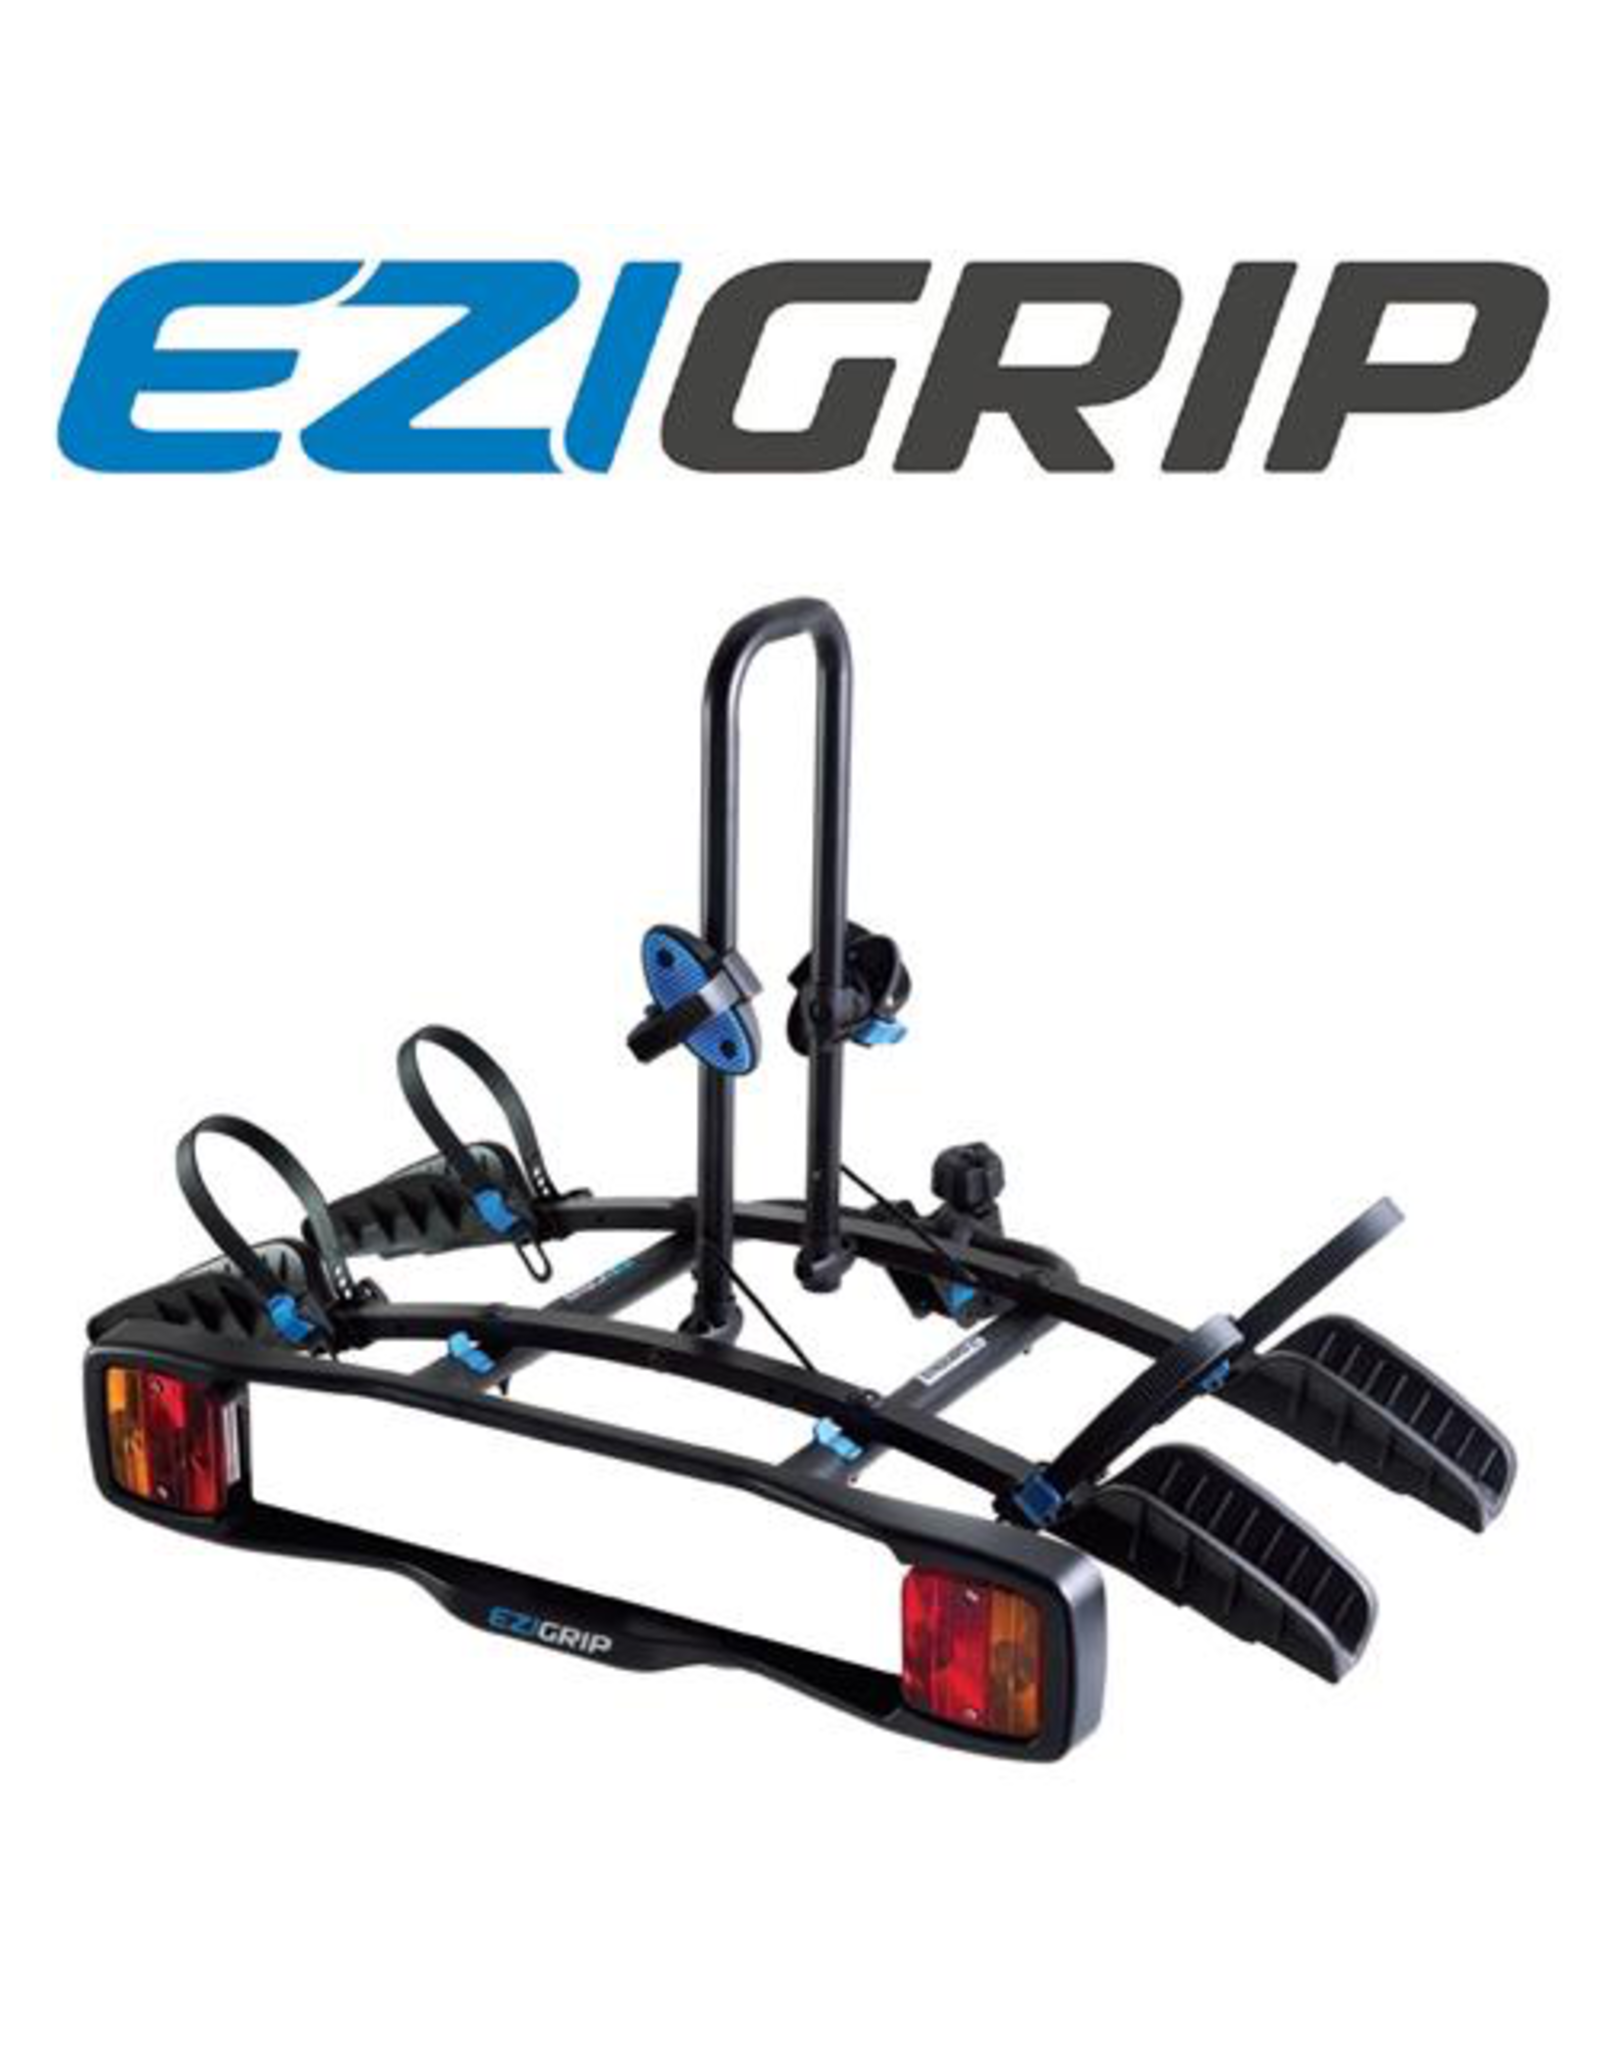 EZI GRIP CAR RACK EZIGRIP PLATFORM 2 ENDURO BIKE CARRIER